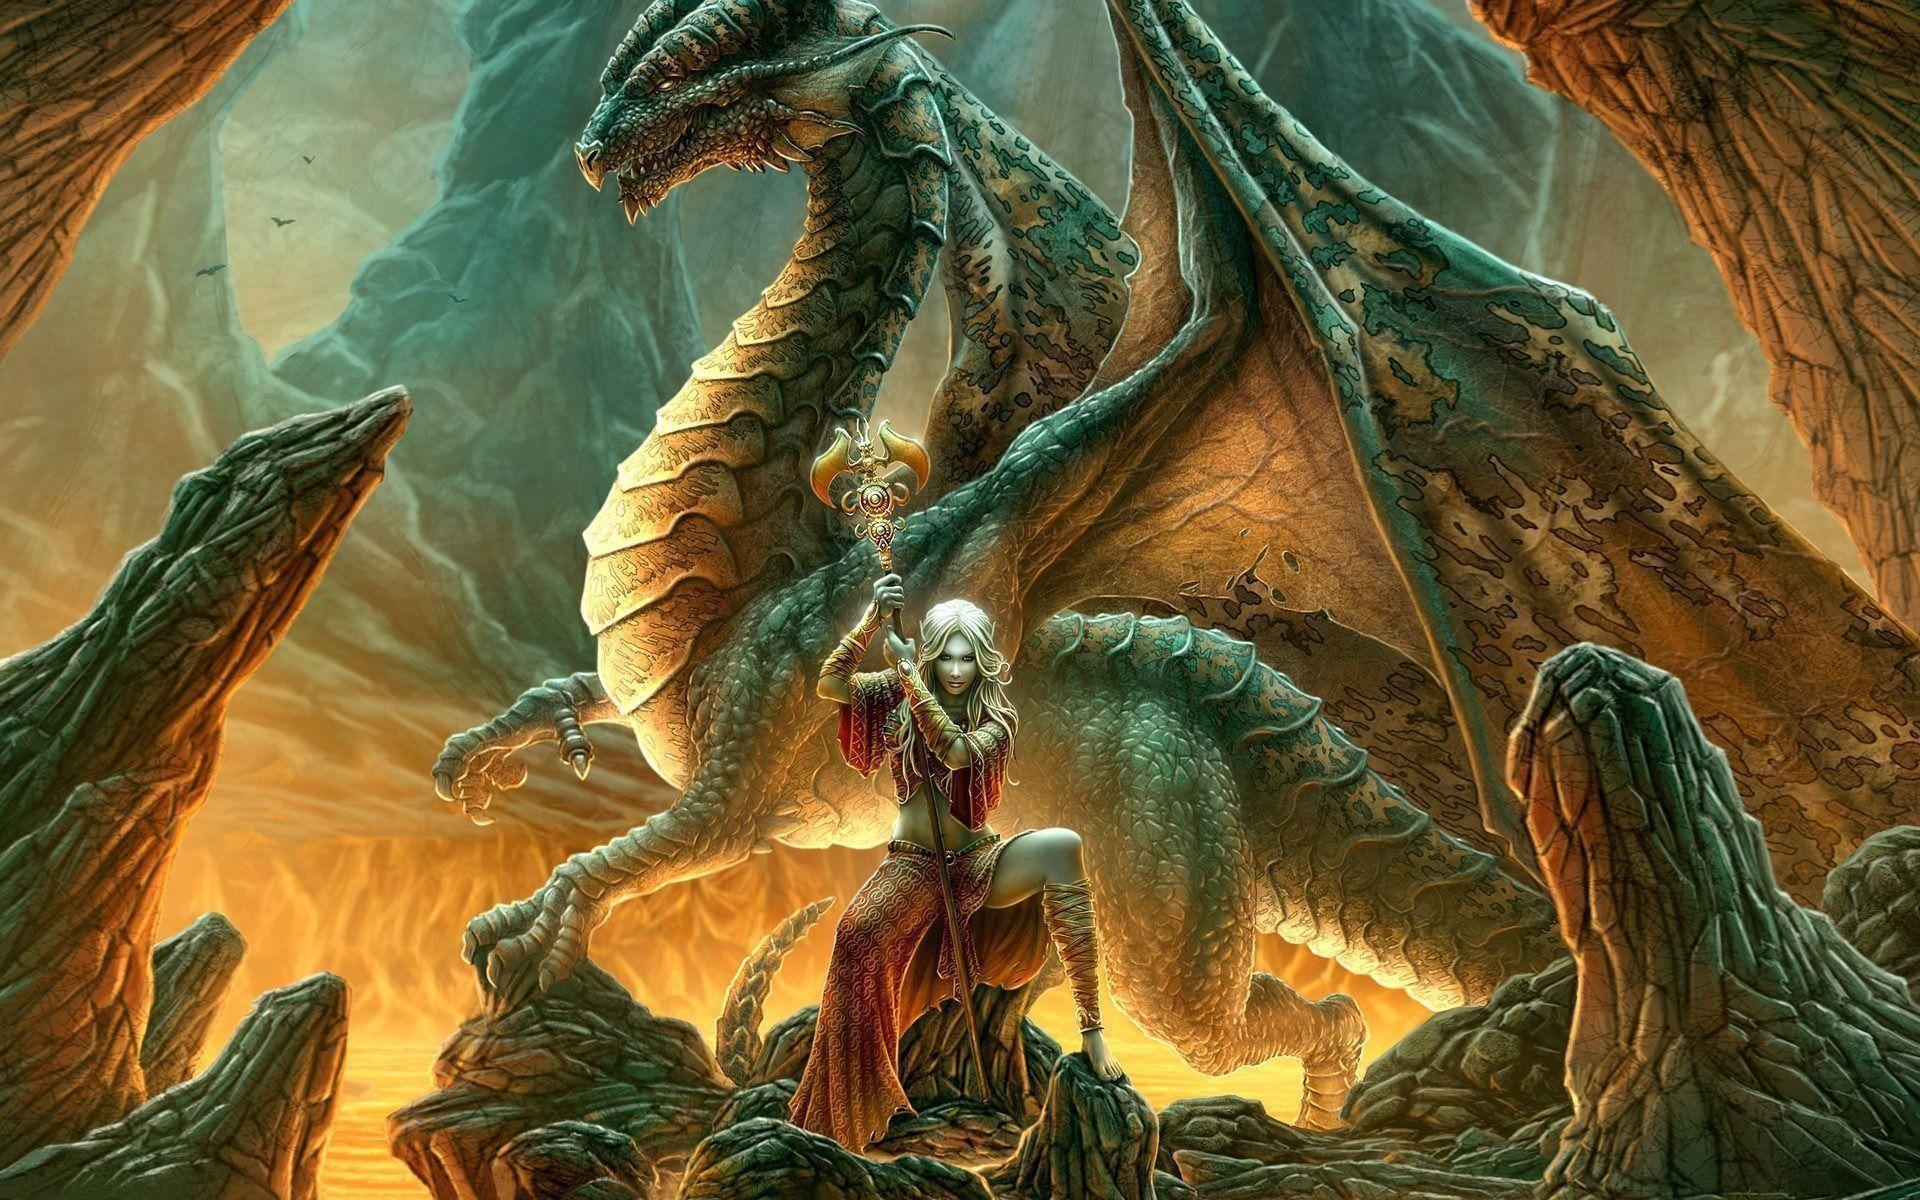 1080p Wallpaper Dragon, wallpaper, 1080p Wallpaper Dragon hd .